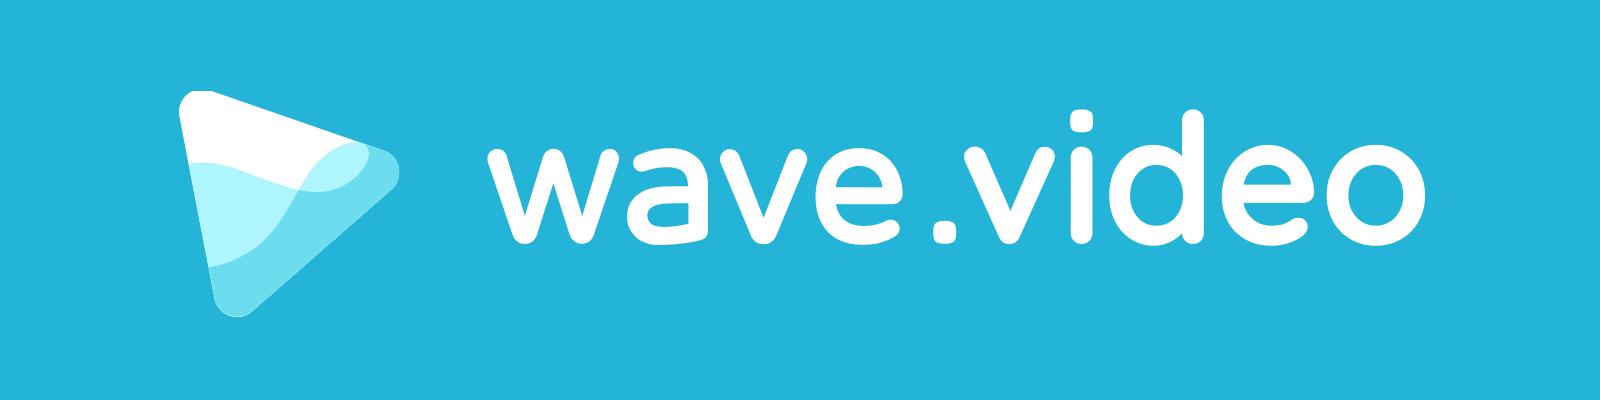 Wave.Video Video Maker